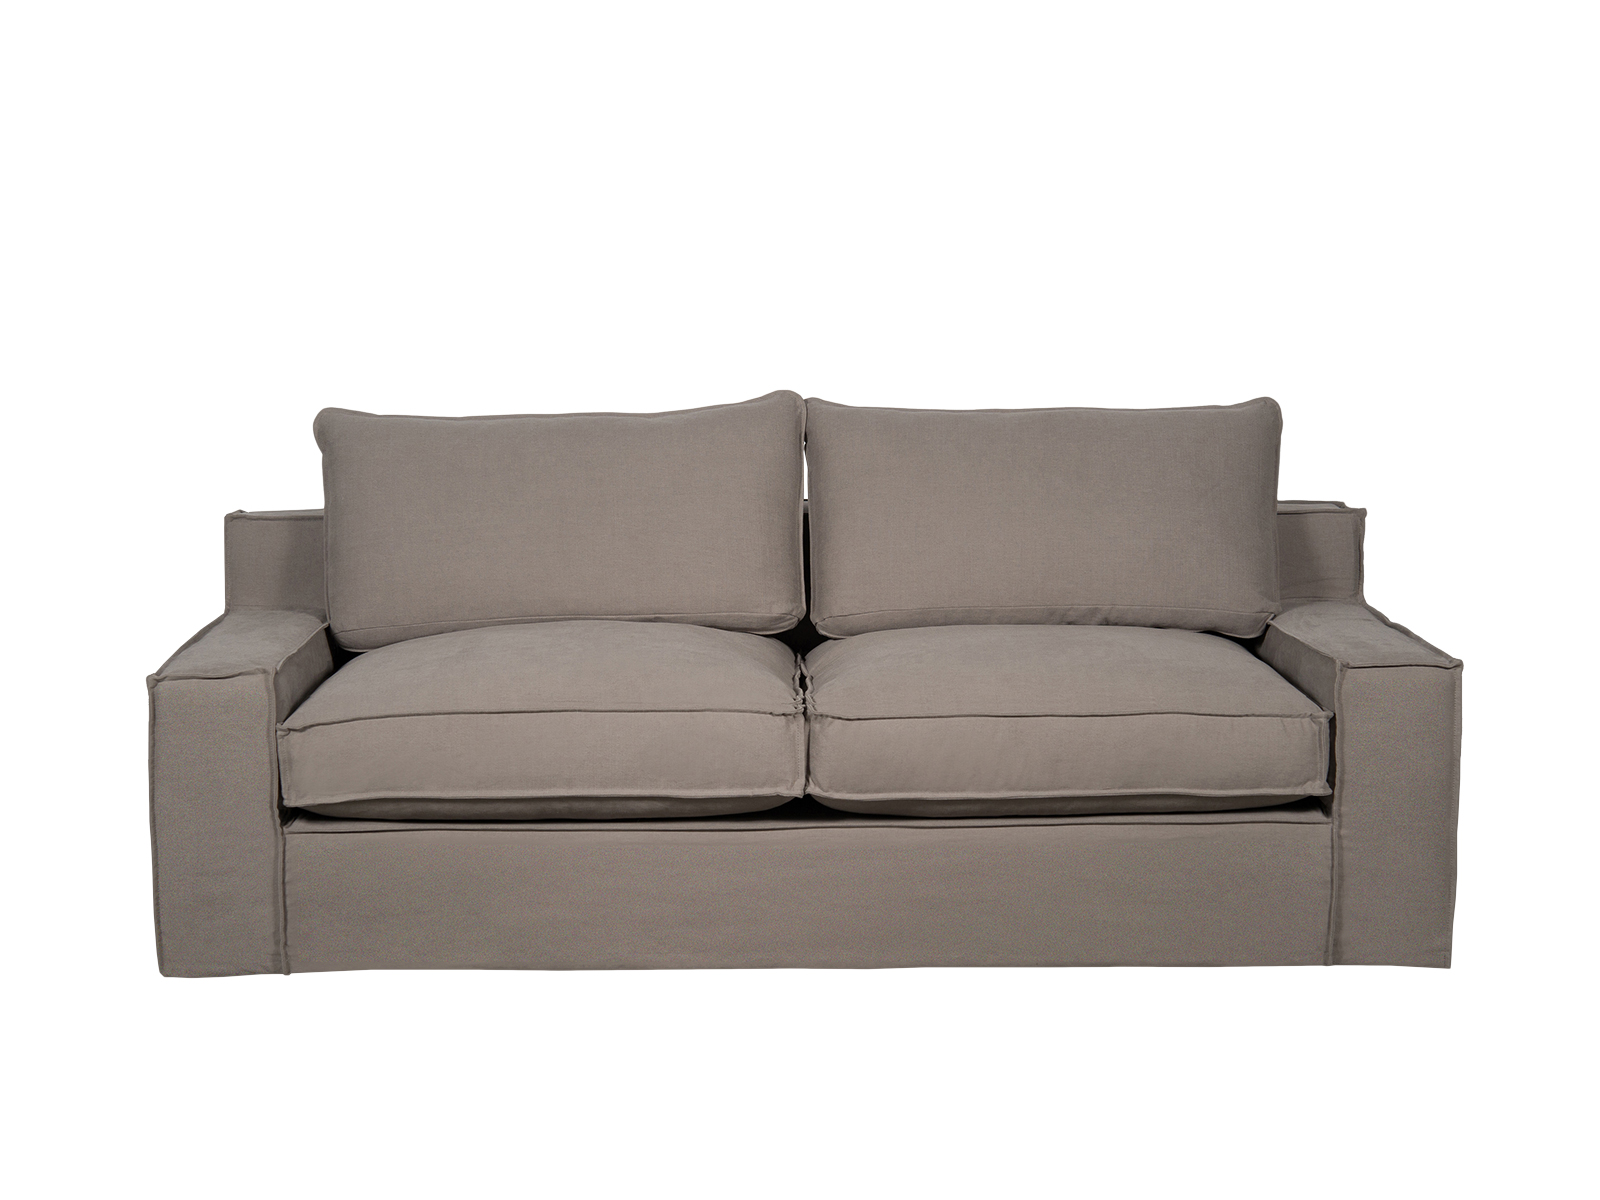 Canapea fixa 3 locuri Capri Brown